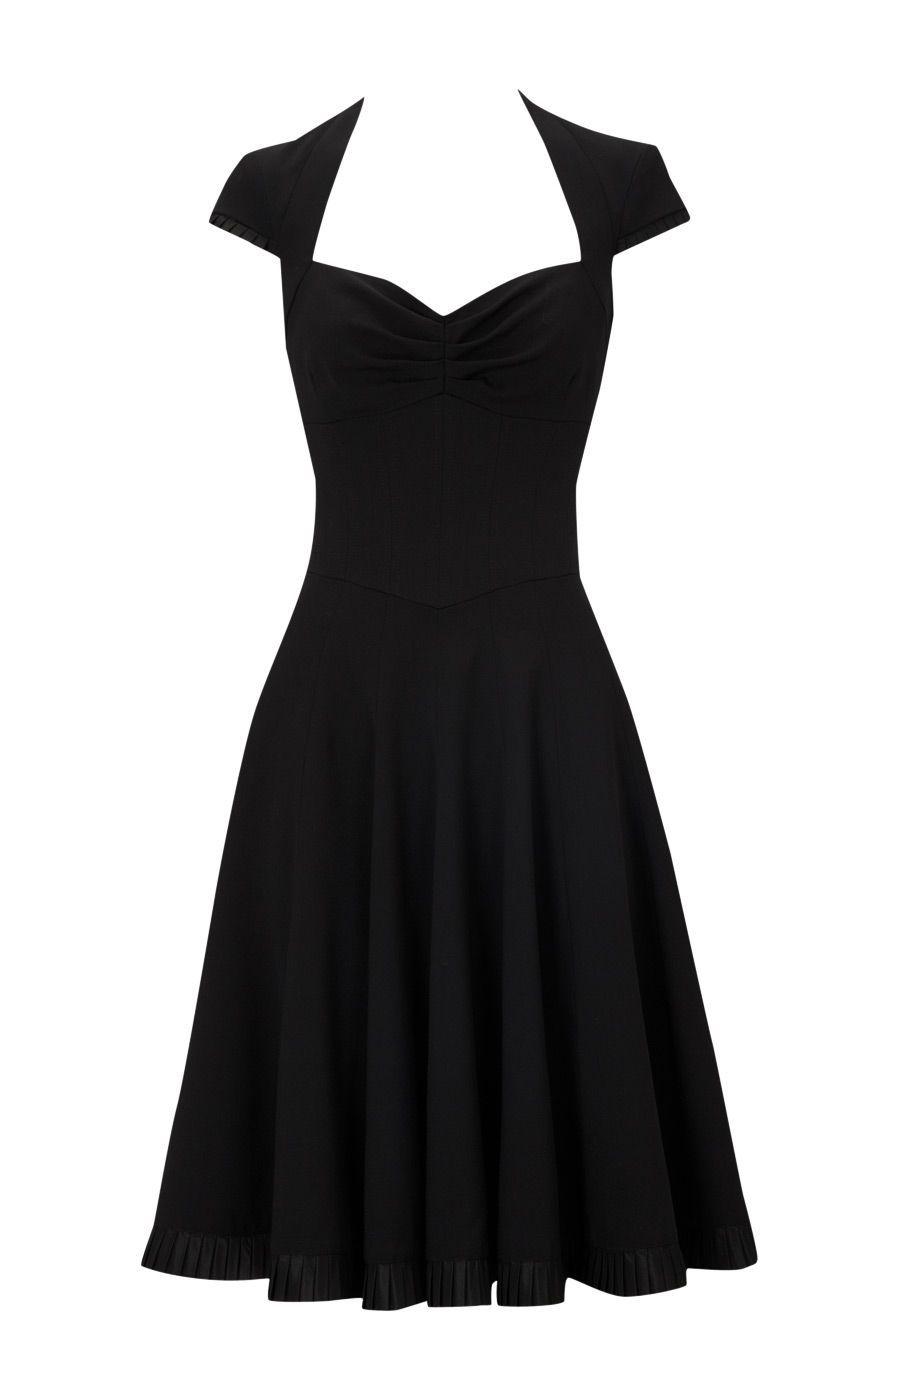 Is a black dress ok to wear to a wedding  us style dress by Karen Millen  Vintage s Dresses Wedding